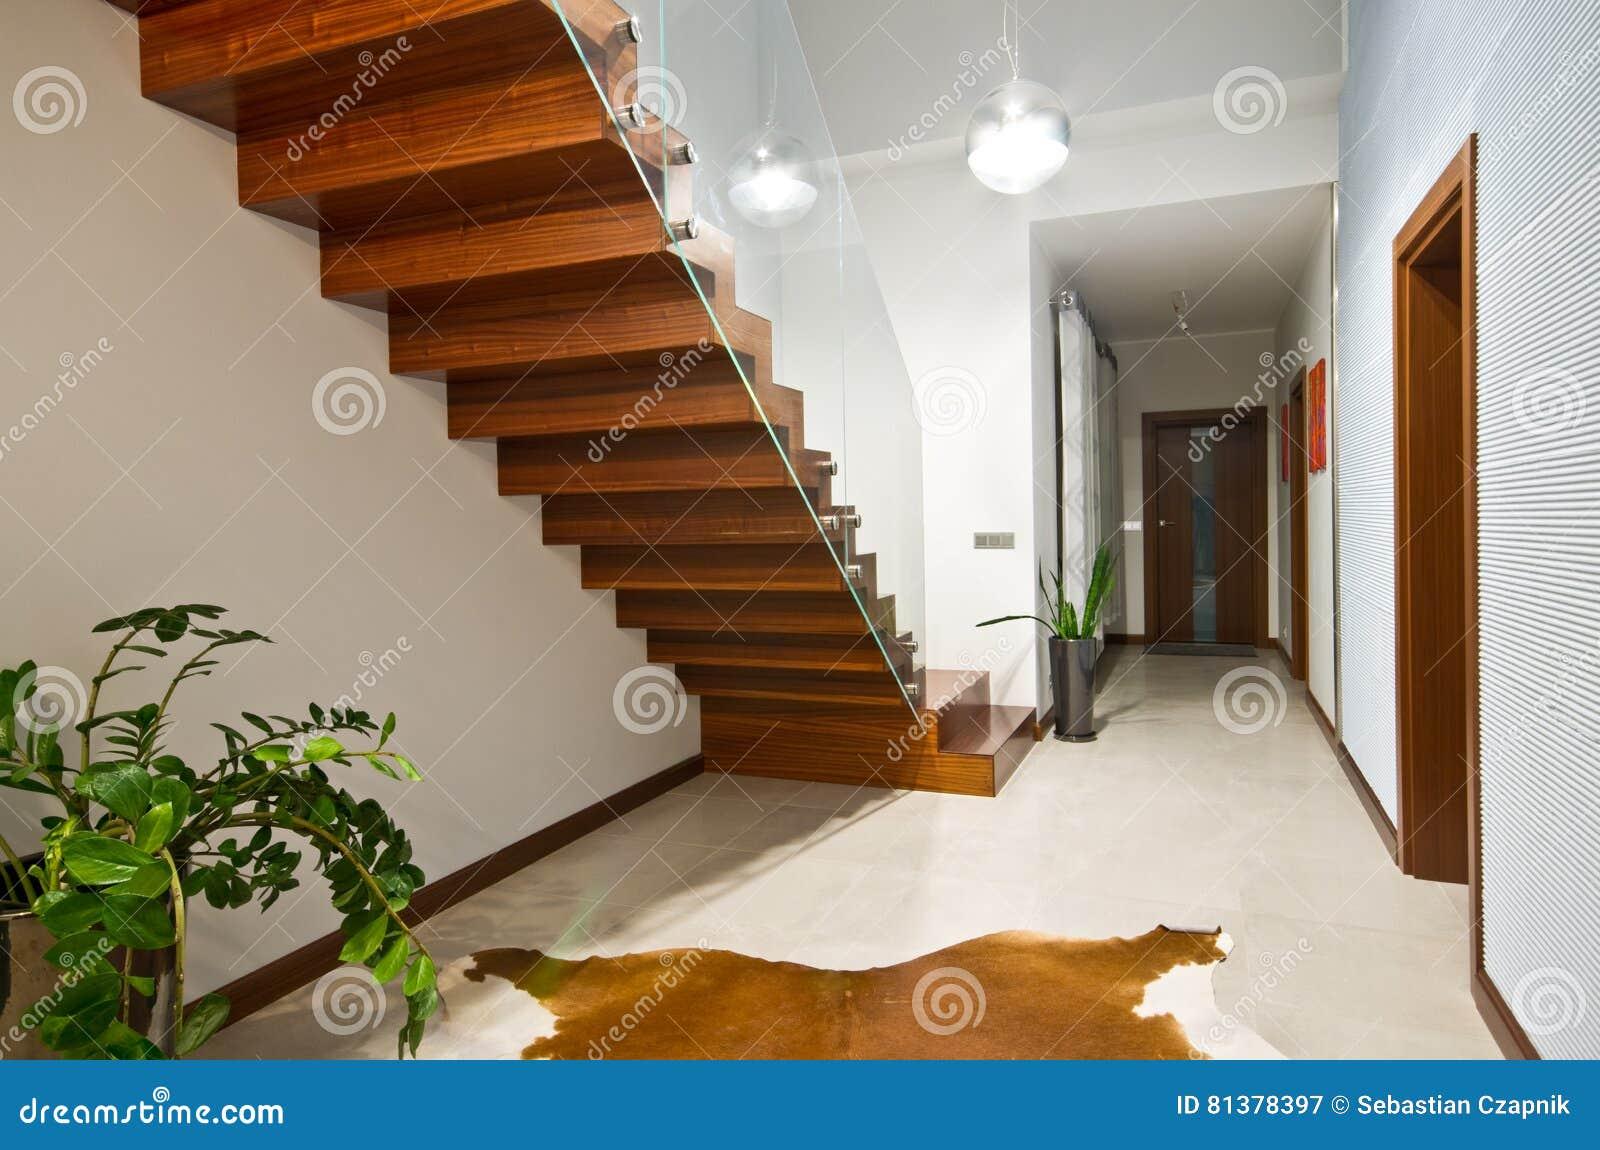 Escaliers Modernes Avec La Balustrade En Verre Image stock ...